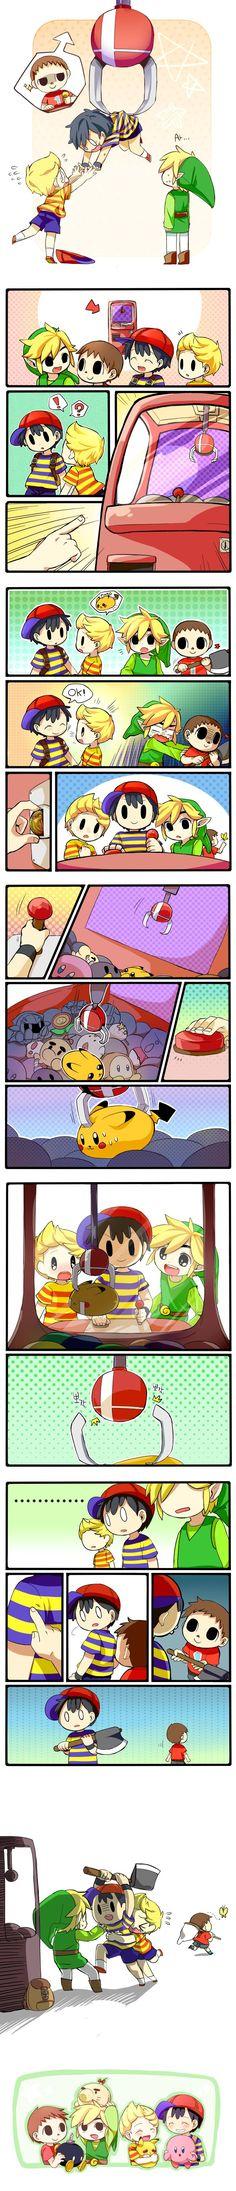 Super Smash Bros: